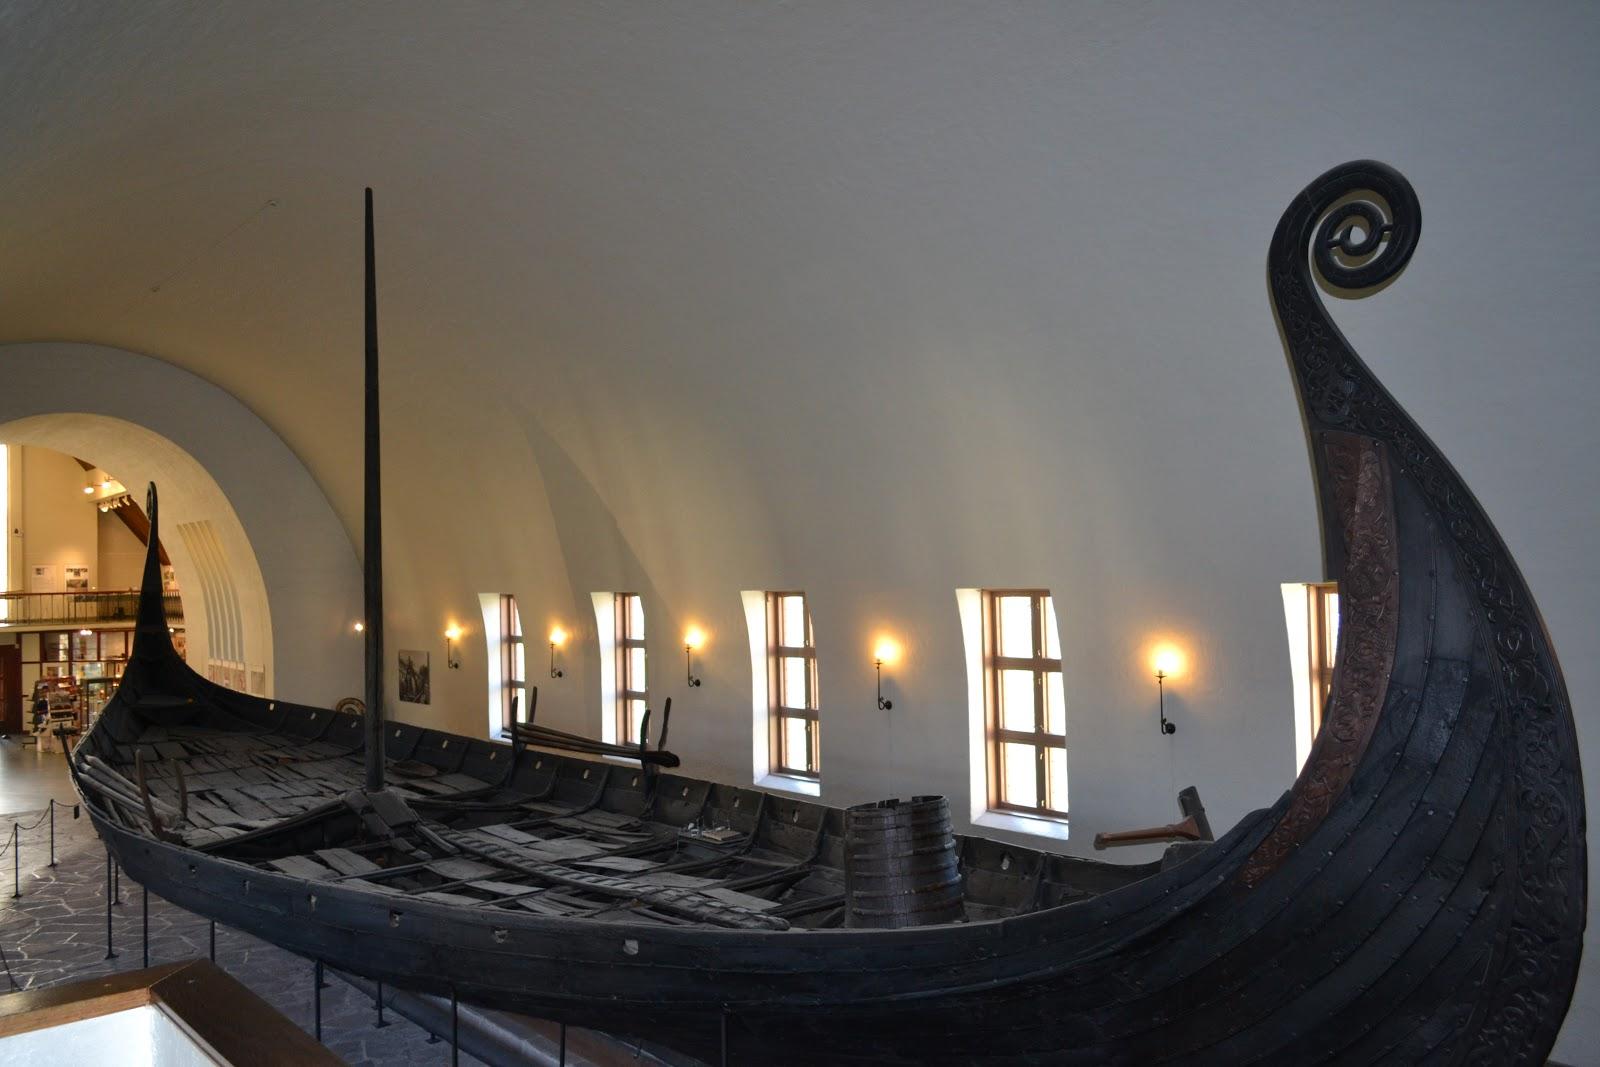 Viking ships of 9th century